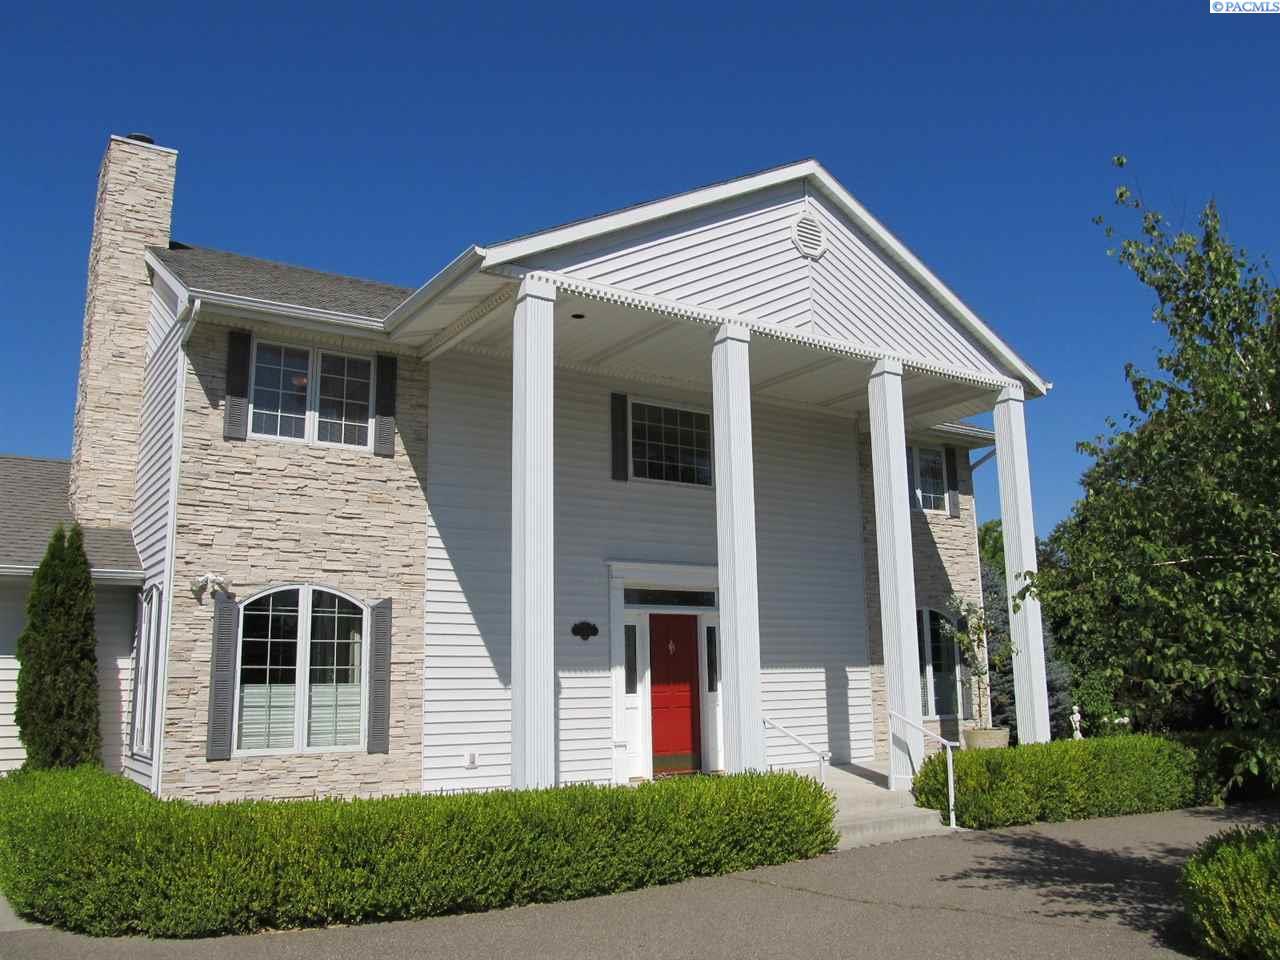 Single Family Home for Sale at 308 Shaw St 308 Shaw St Richland, Washington 99354 United States